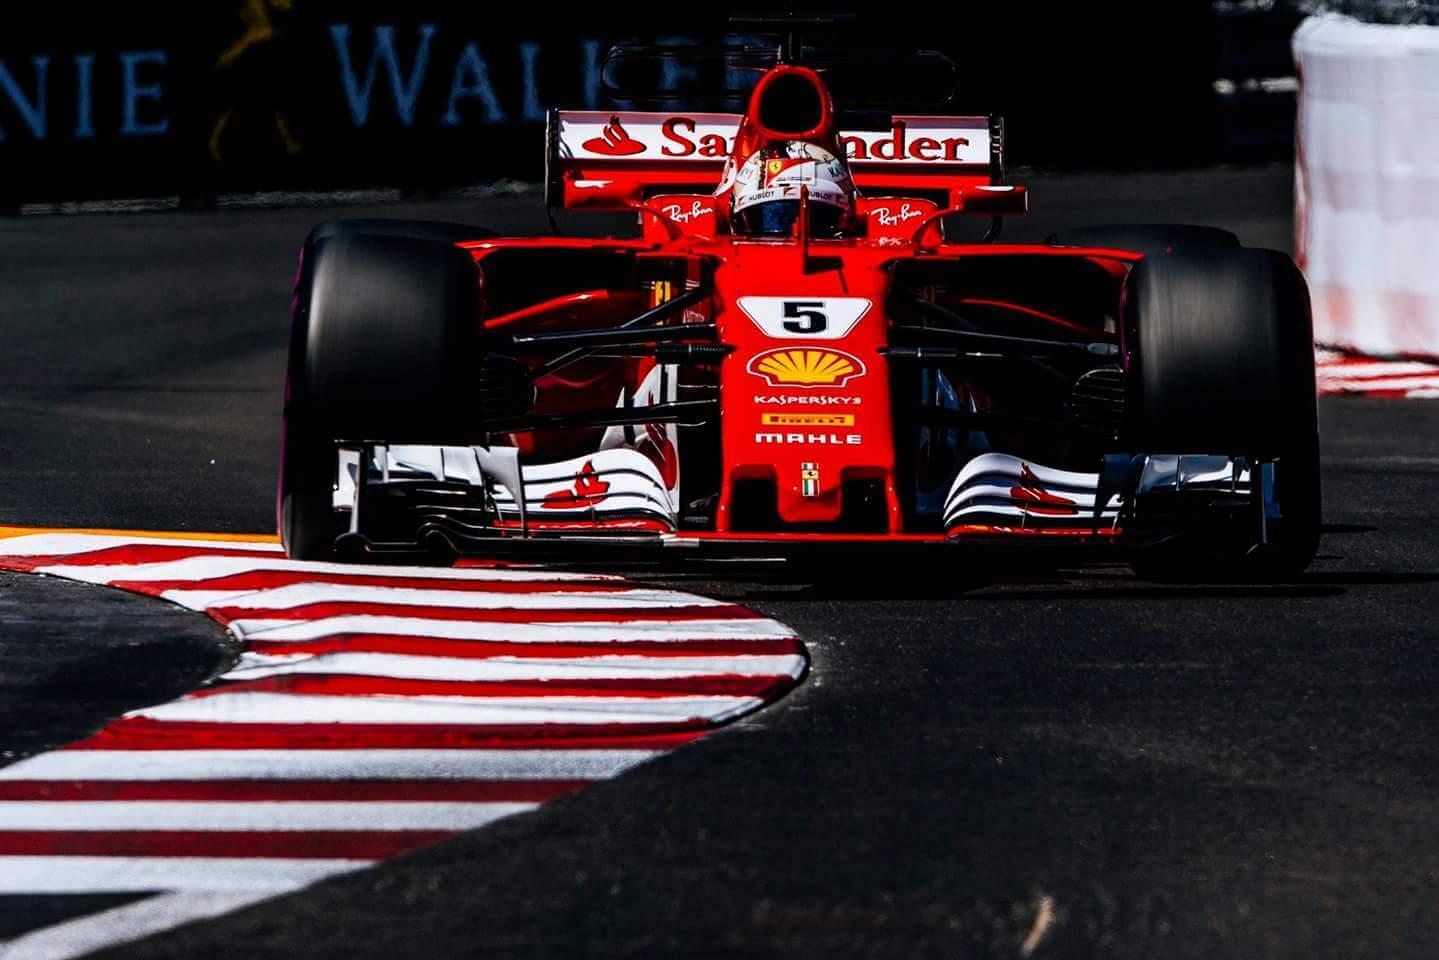 Vettel a câștigat Marele Premiu al Principatului Monaco Vettel a câștigat Marele Premiu al Principatului Monaco FB IMG 1495985340907